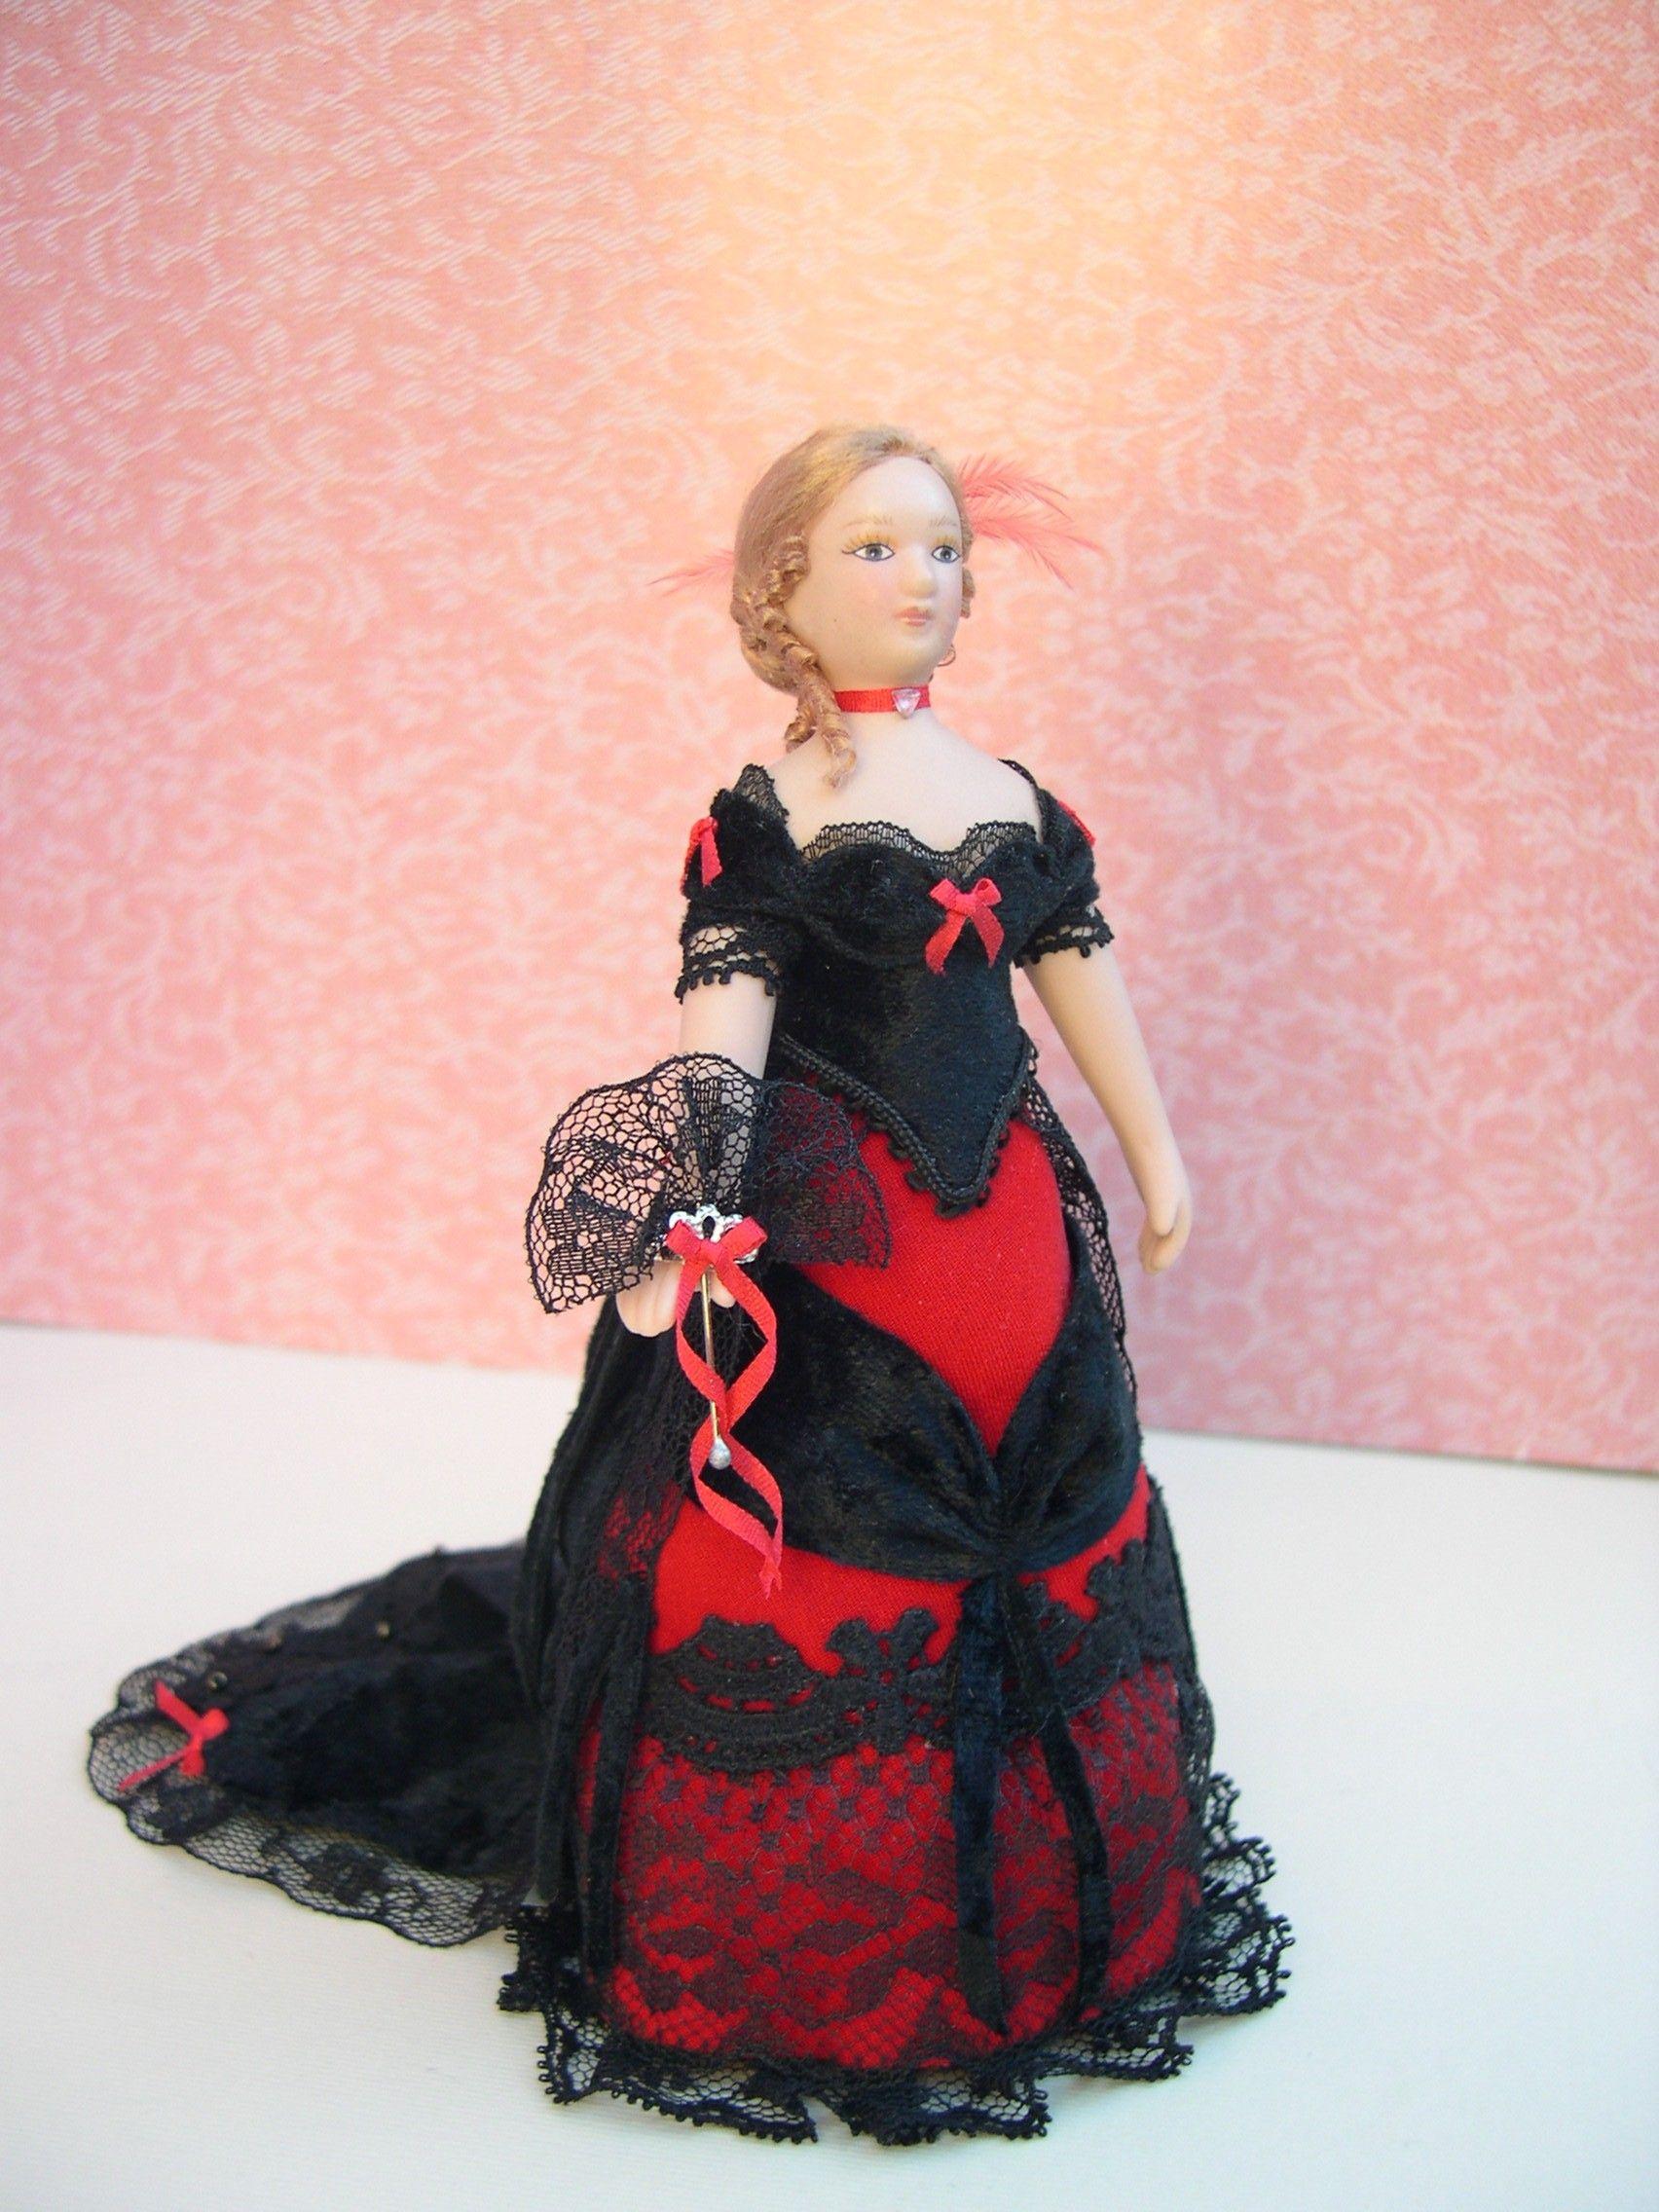 Muñeca vestido de fiesta rojo y negro | miniatüre dám | Pinterest ...